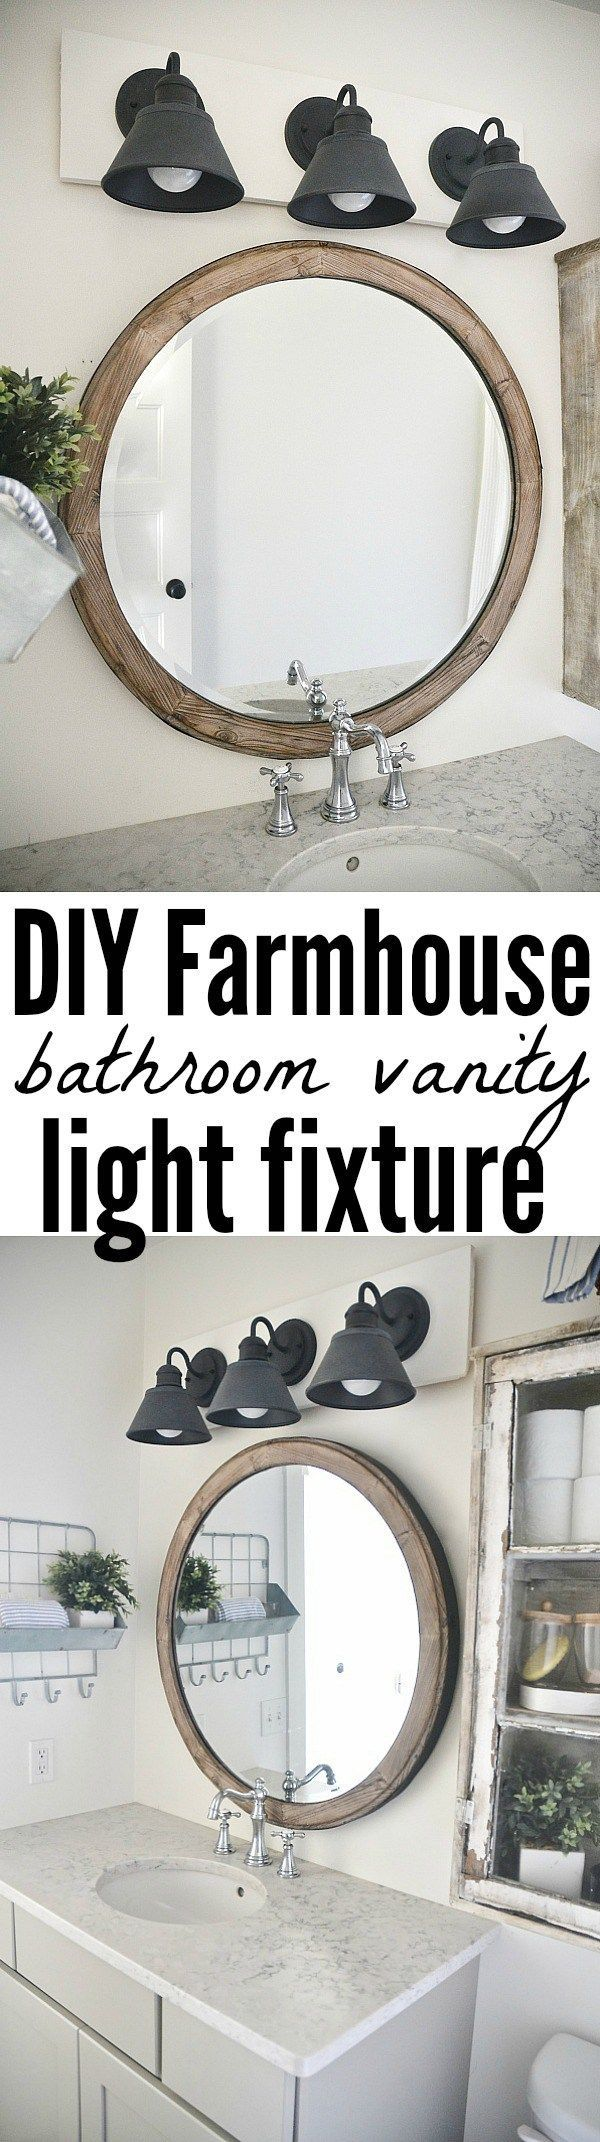 Best 25 farmhouse vanity lights ideas on pinterest farmhouse see how to make this super simple farmhouse bathroom vanity light fixture on a budget arubaitofo Choice Image